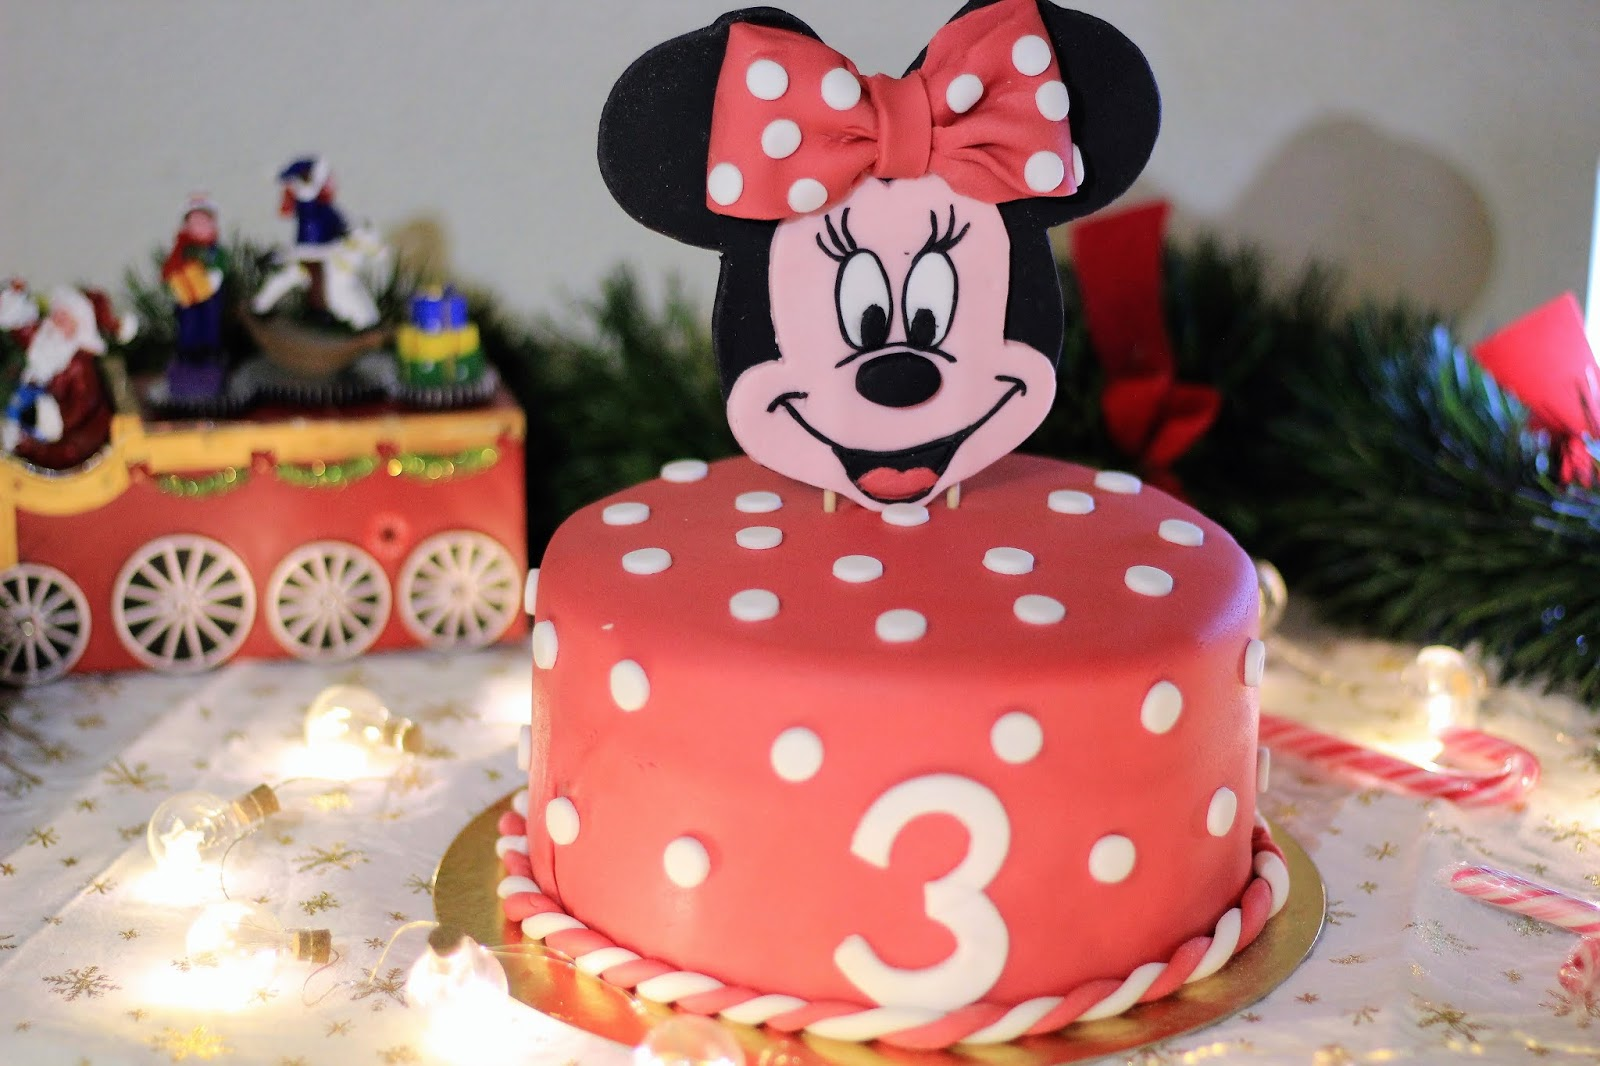 Gâteau Danniversaire Minnie Molly Cake Et Ganache Au Chocolat Jivara